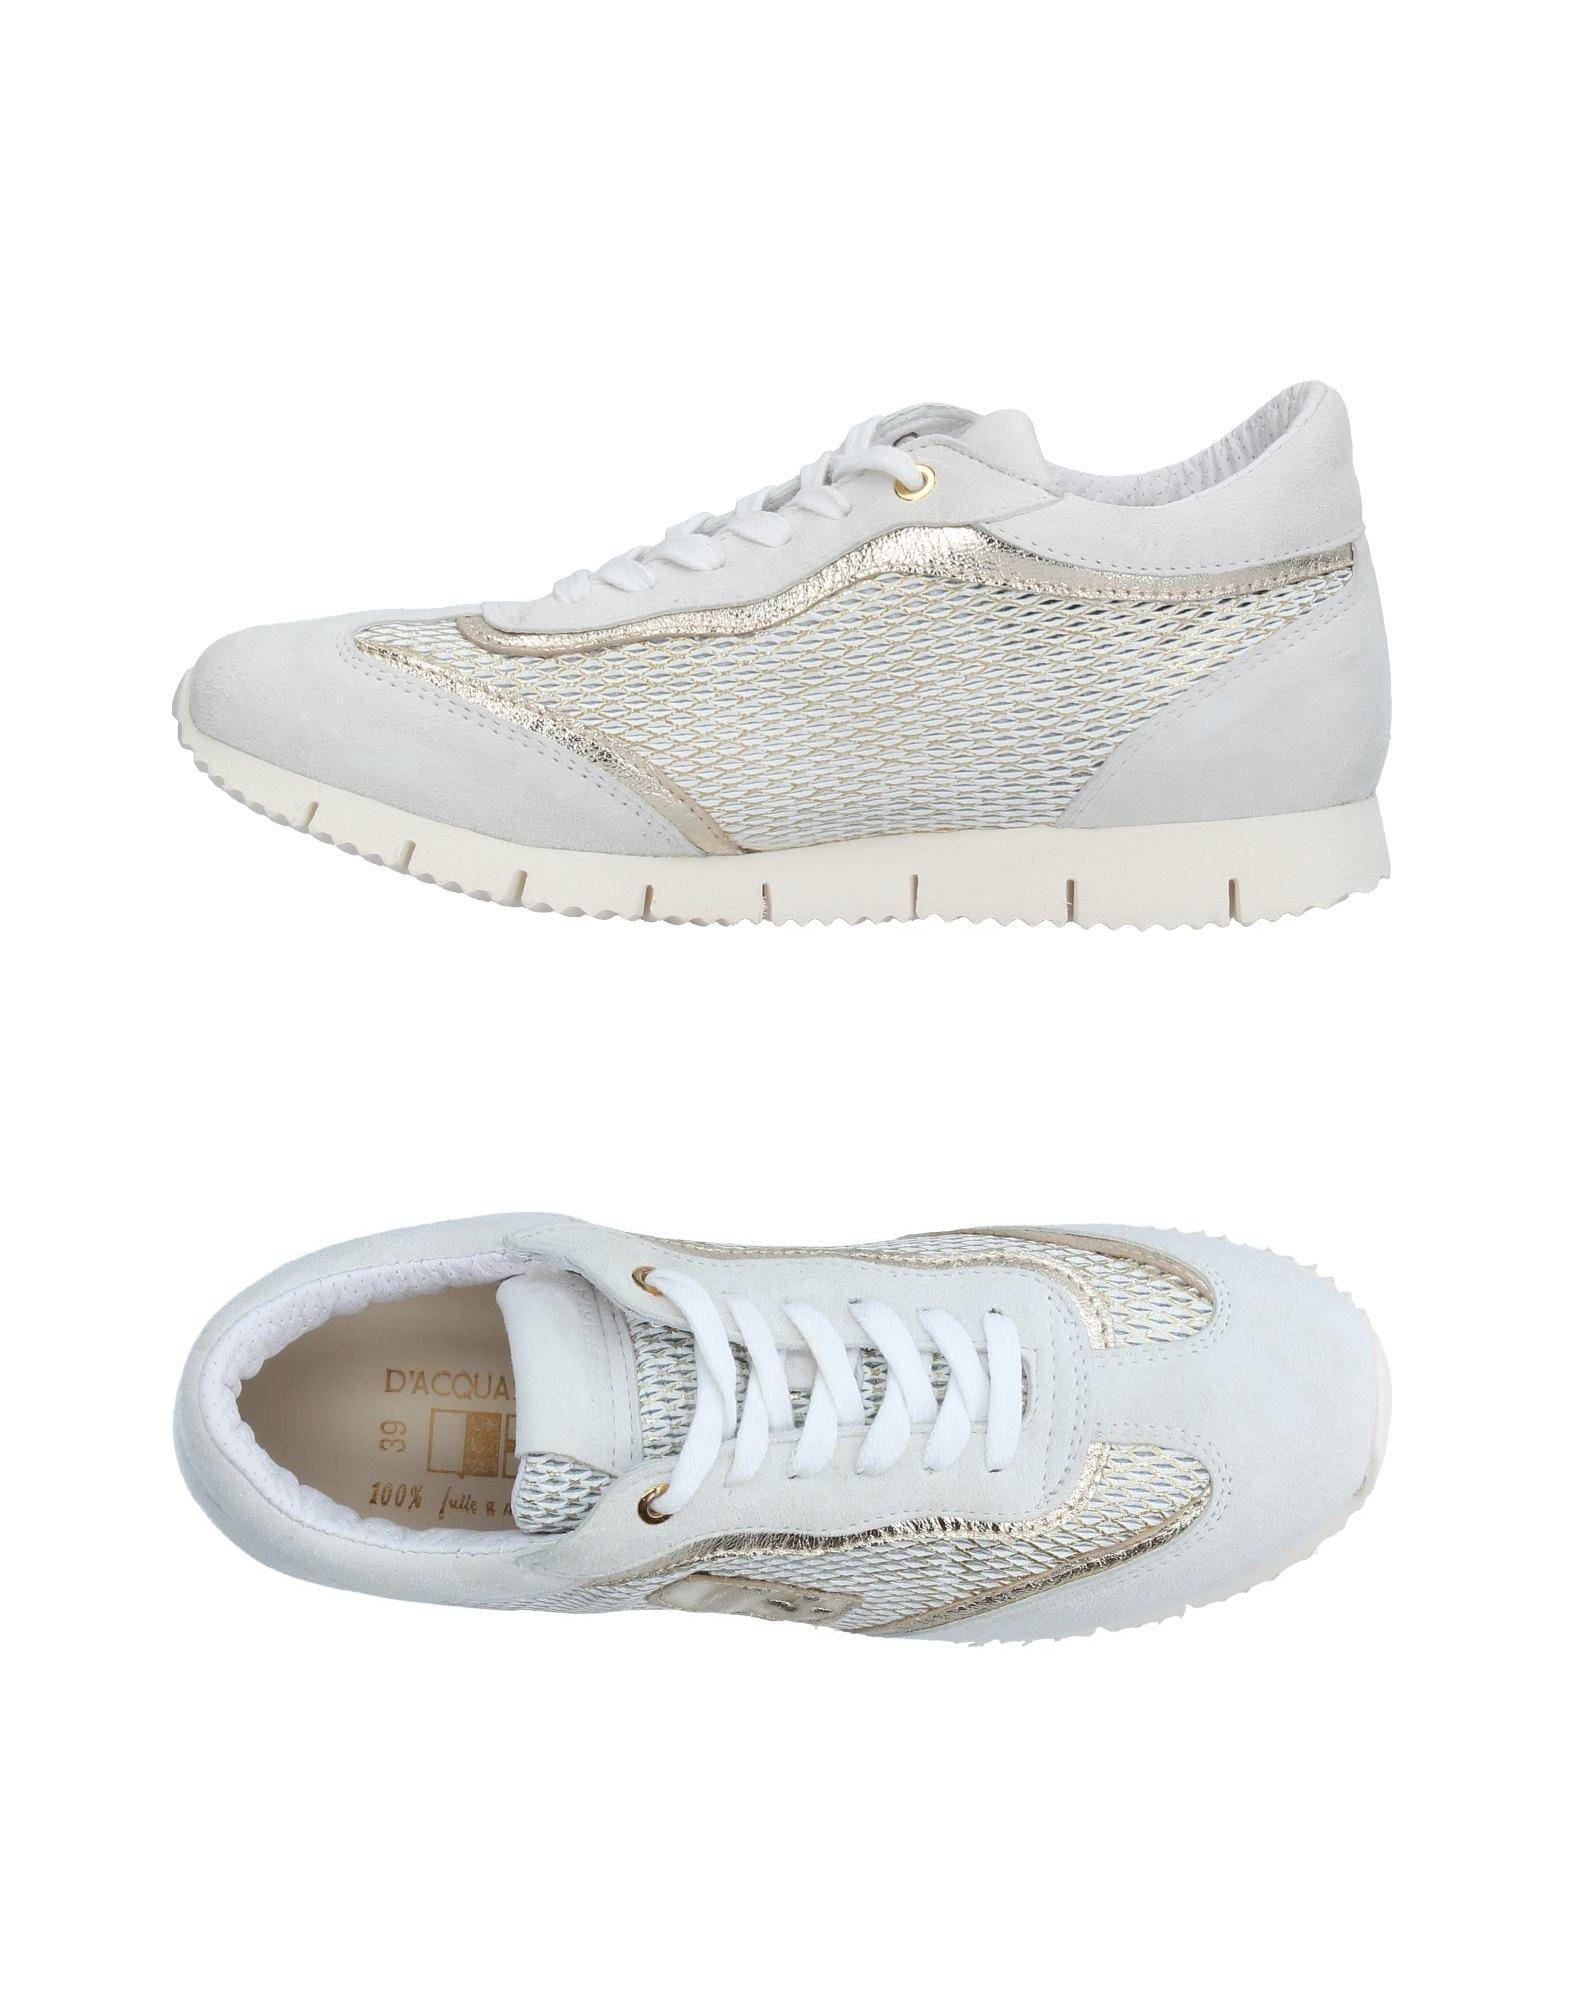 FOOTWEAR - Low-tops & sneakers D'acquasparta ZIaDBvEy9